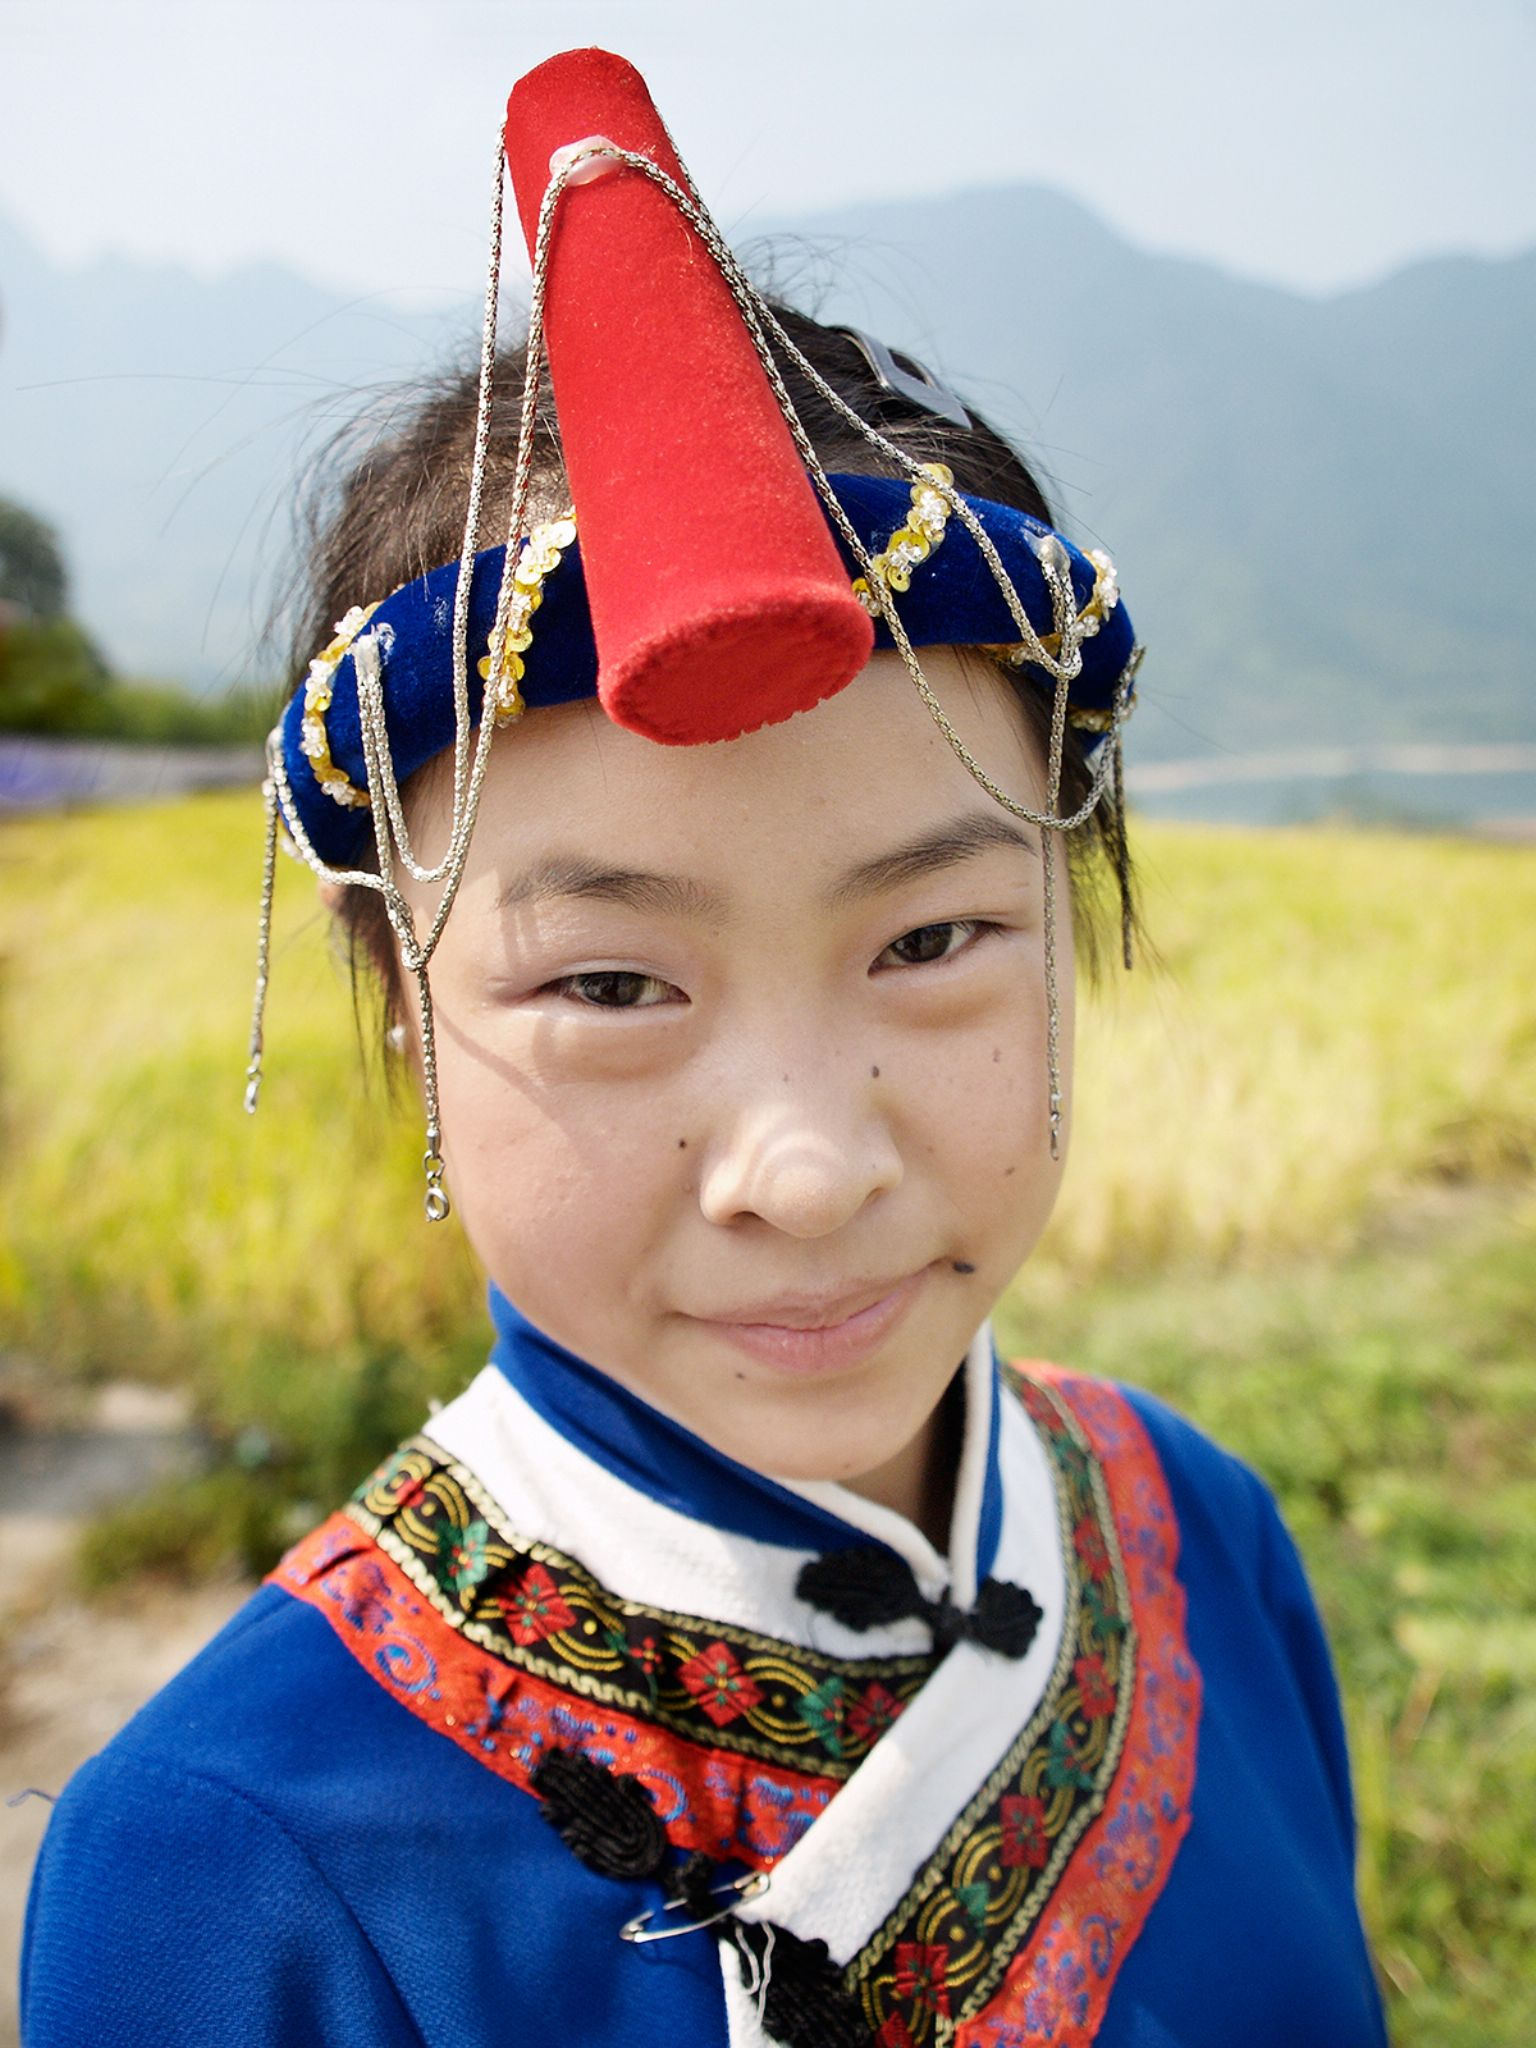 Travel the countryside of China by Yosuke Ito